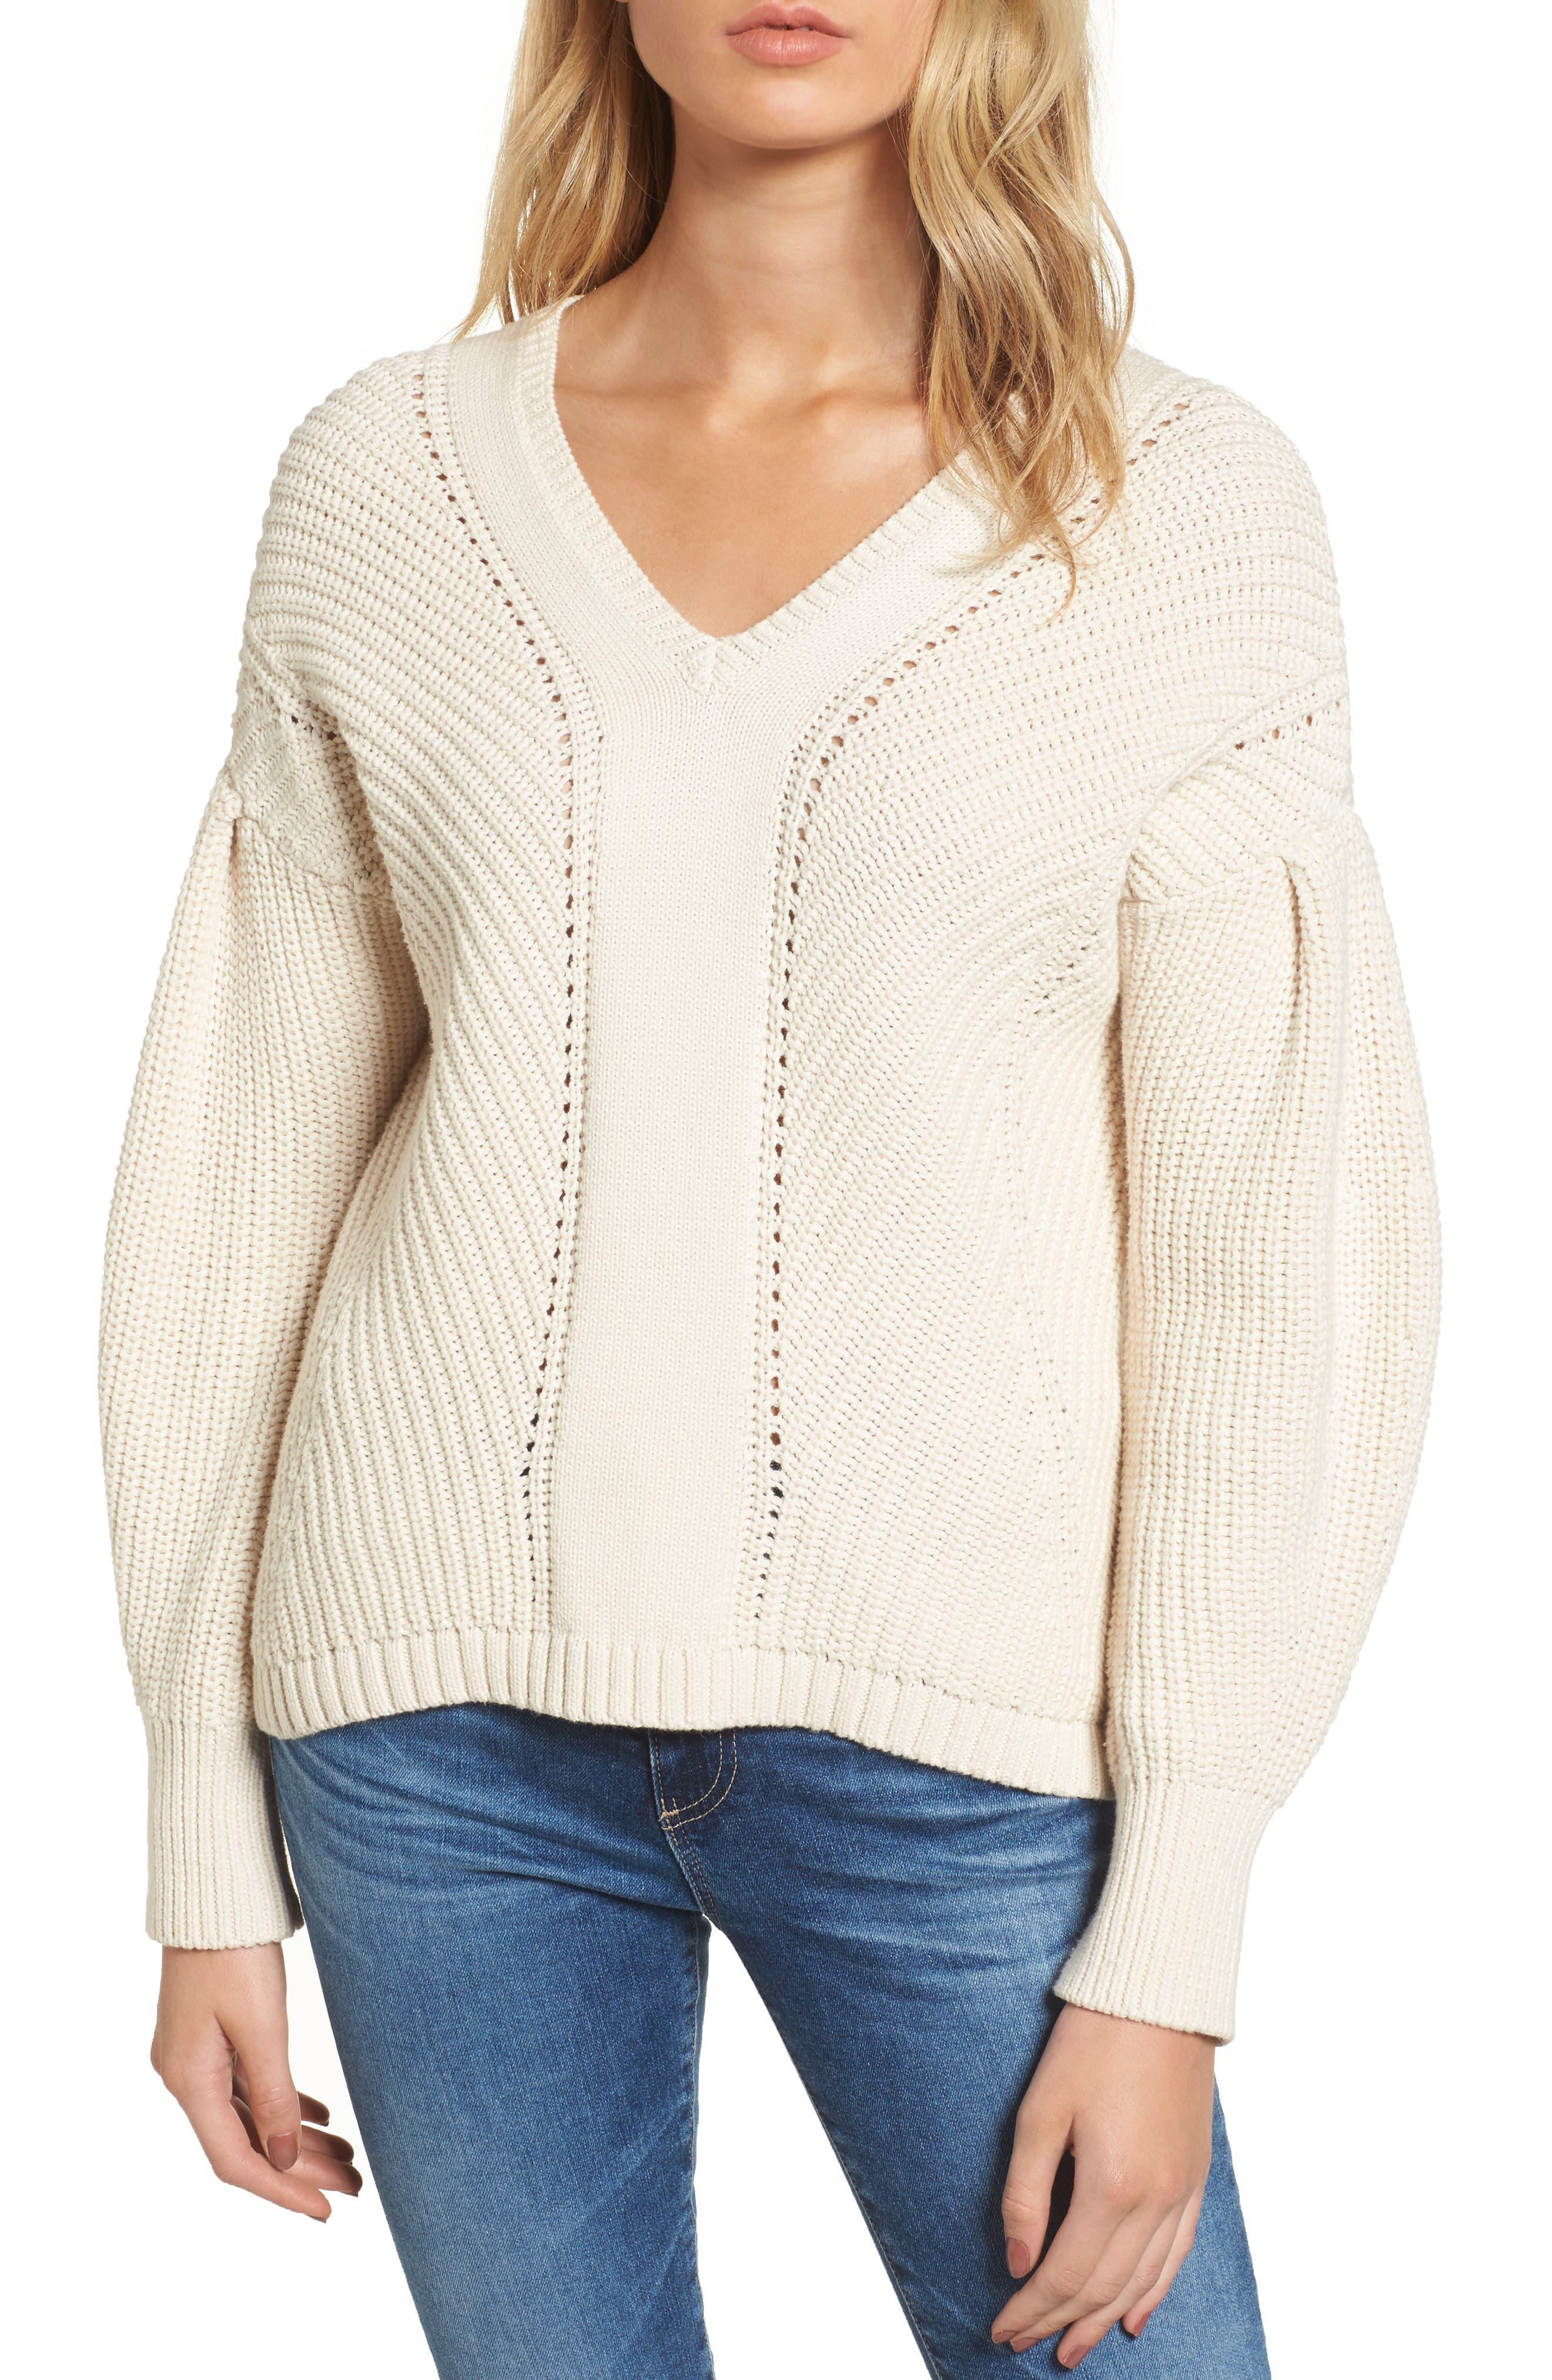 Millie Mozart Sweater,                         Main,                         color, Classic Cream